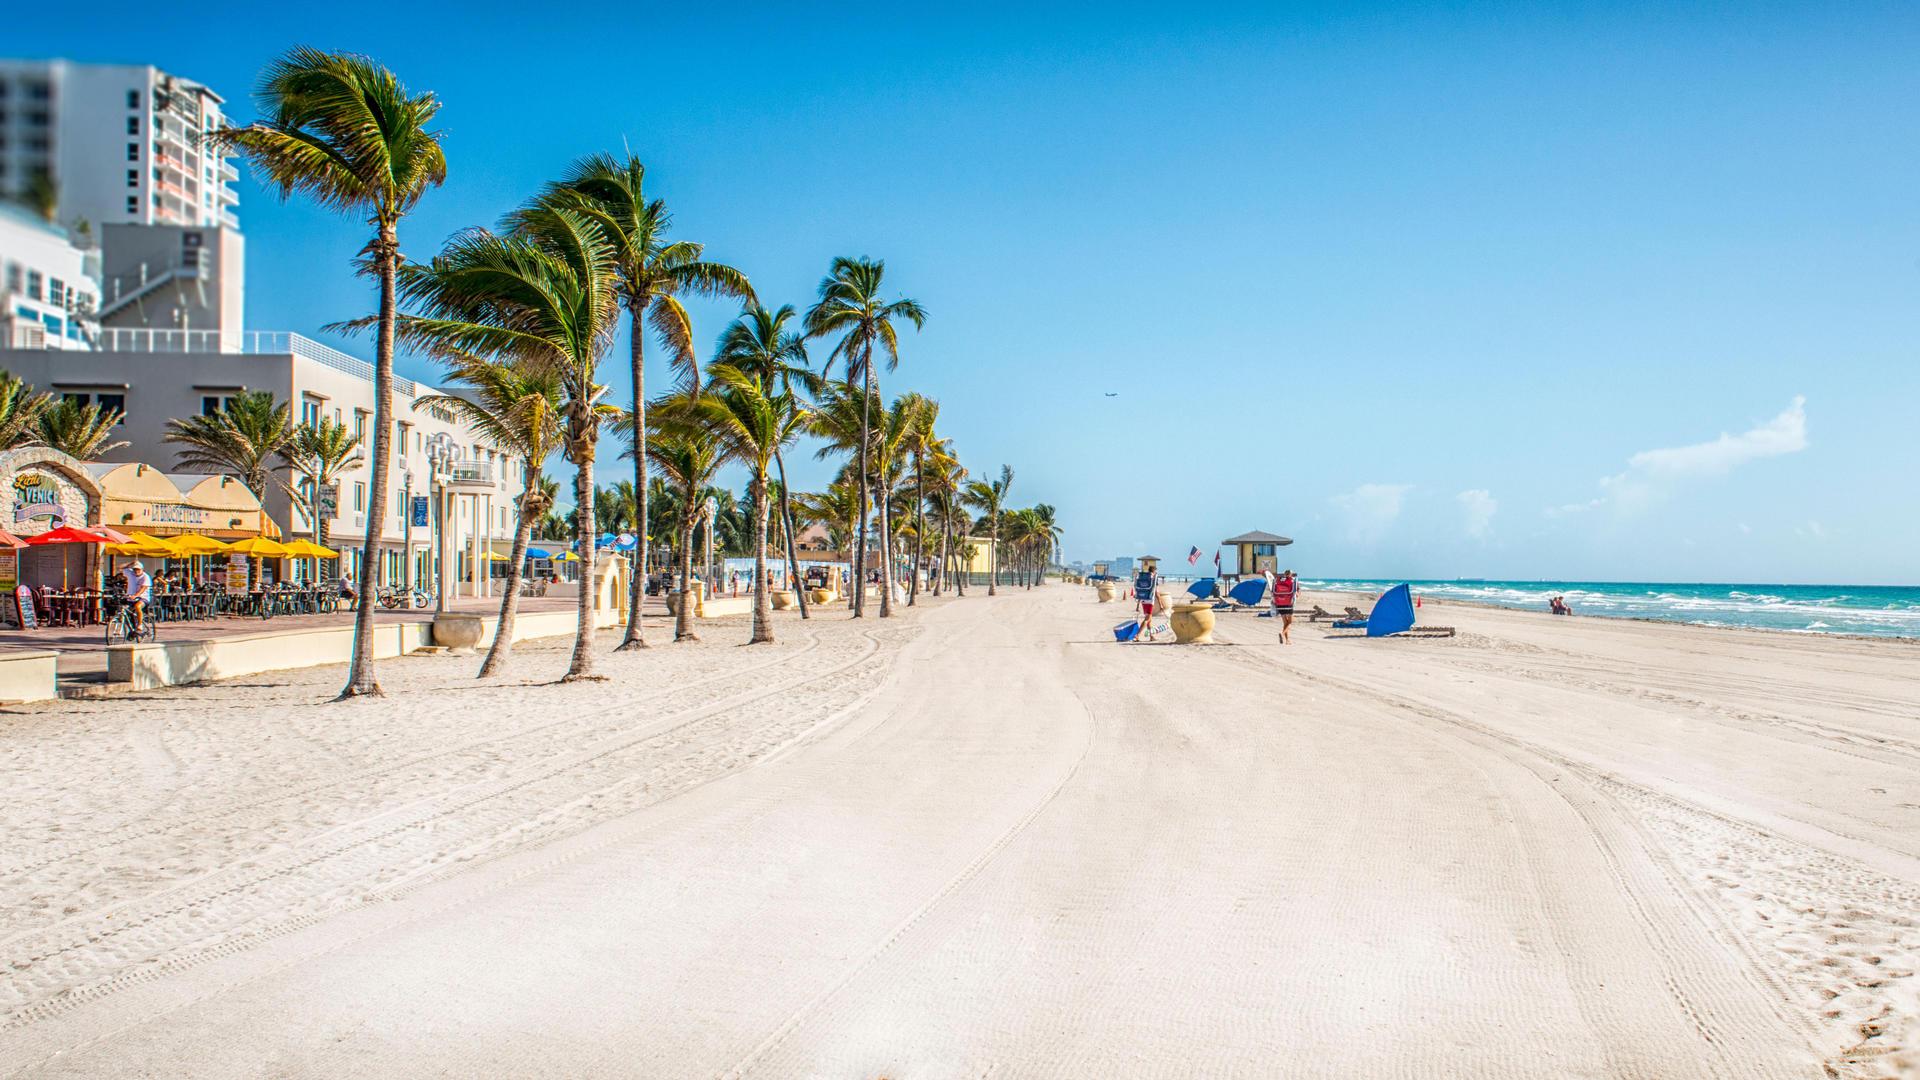 Things To Do In Hollywood Florida Beachwalk Resort 1920x1080